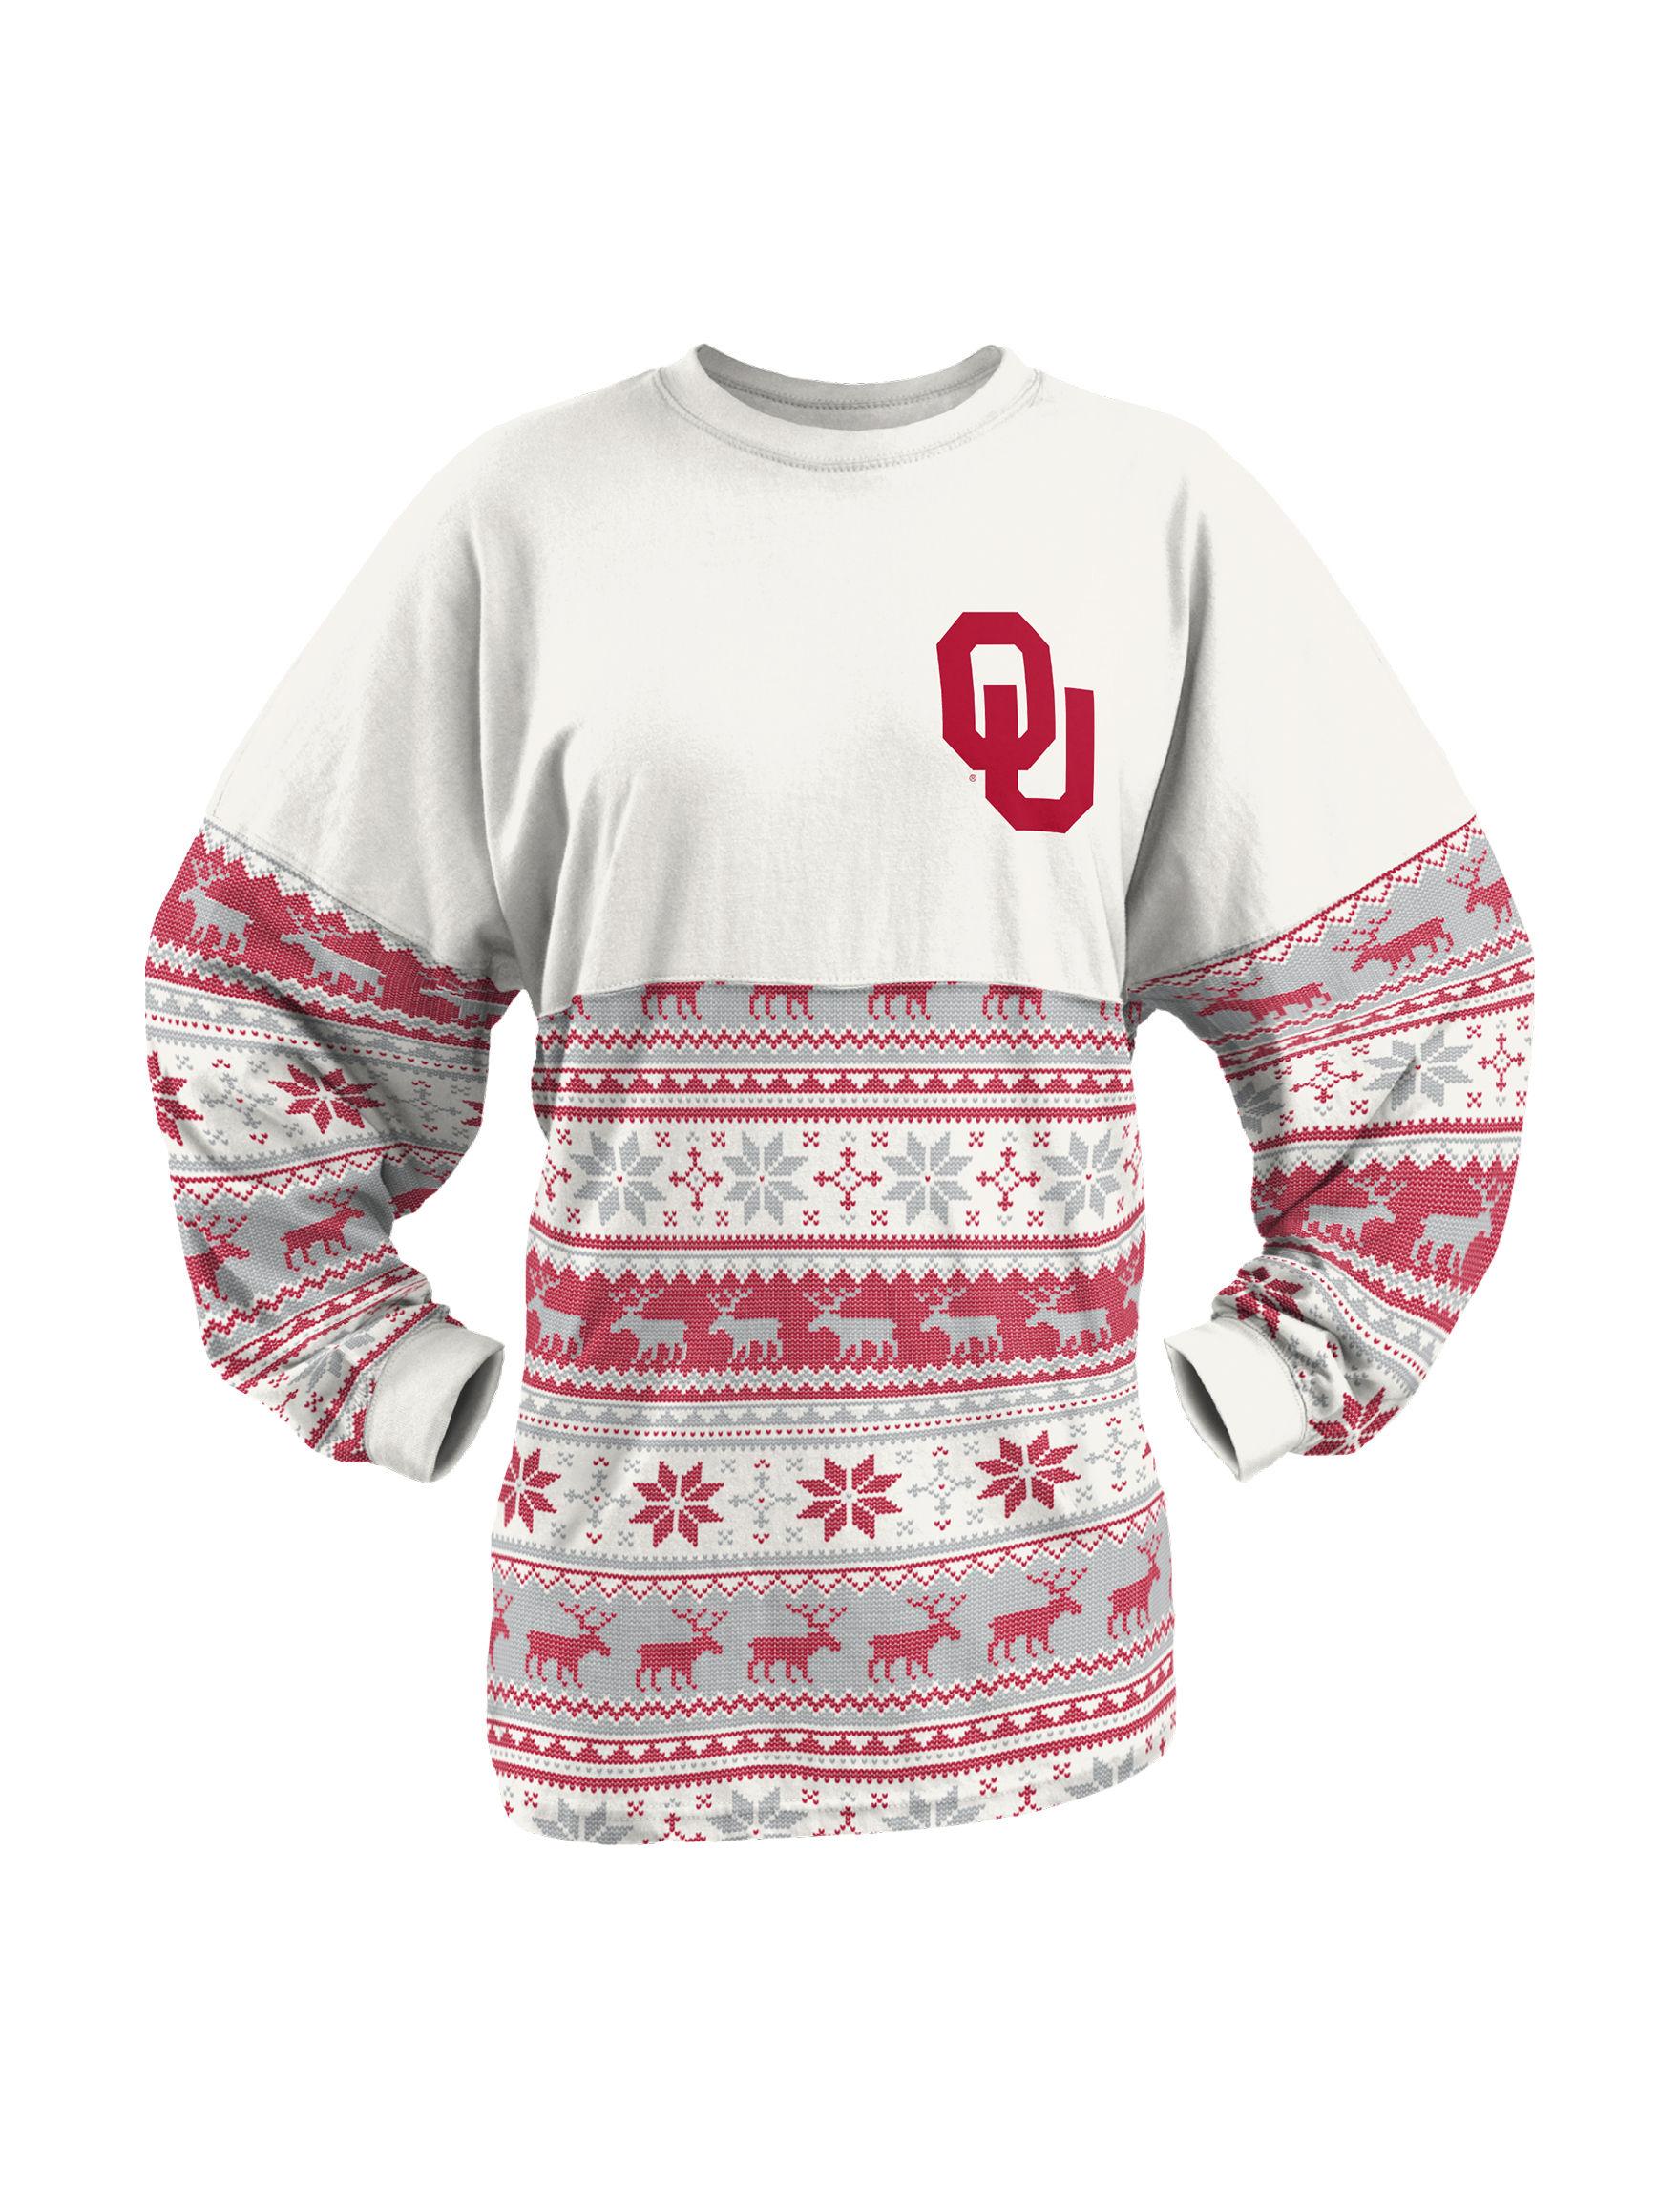 NCAA White Pull-overs Shirts & Blouses Tees & Tanks